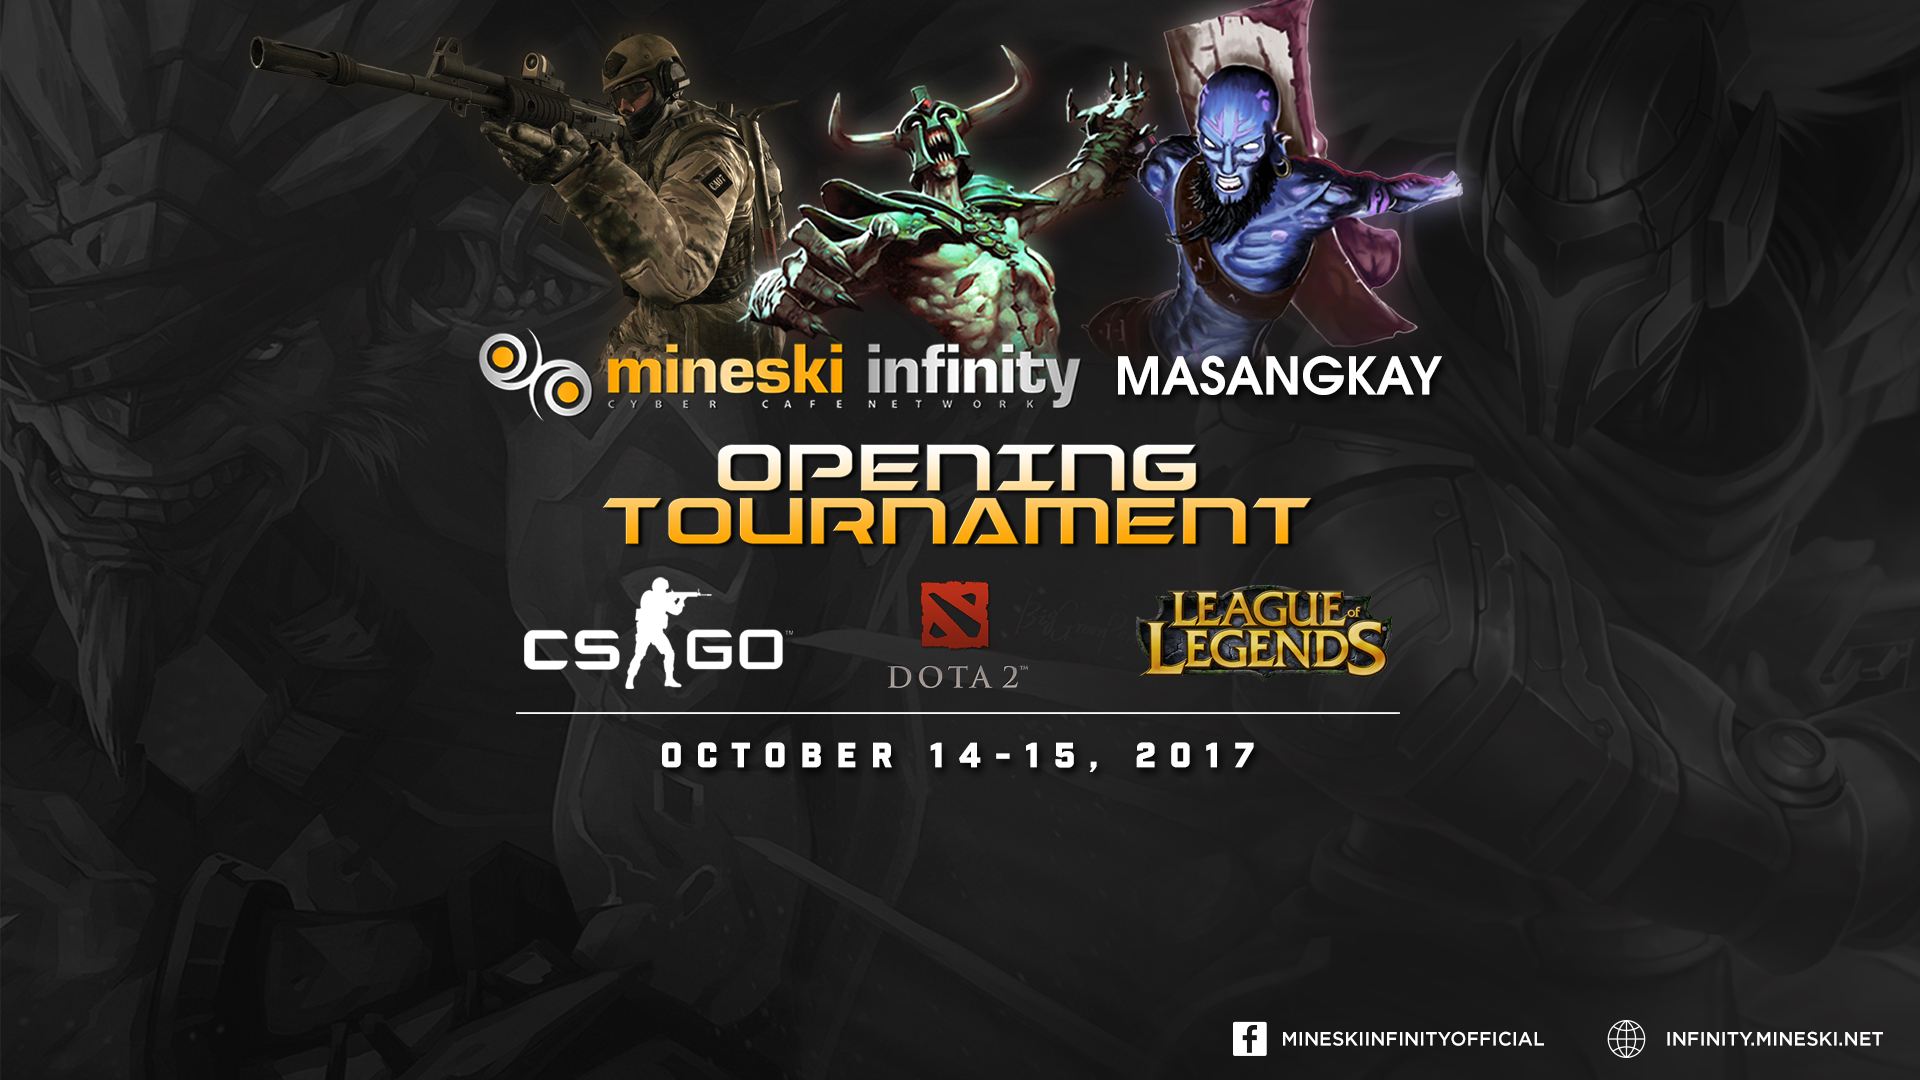 mineski infinity masangkay opening tournament dota 2 lol cs